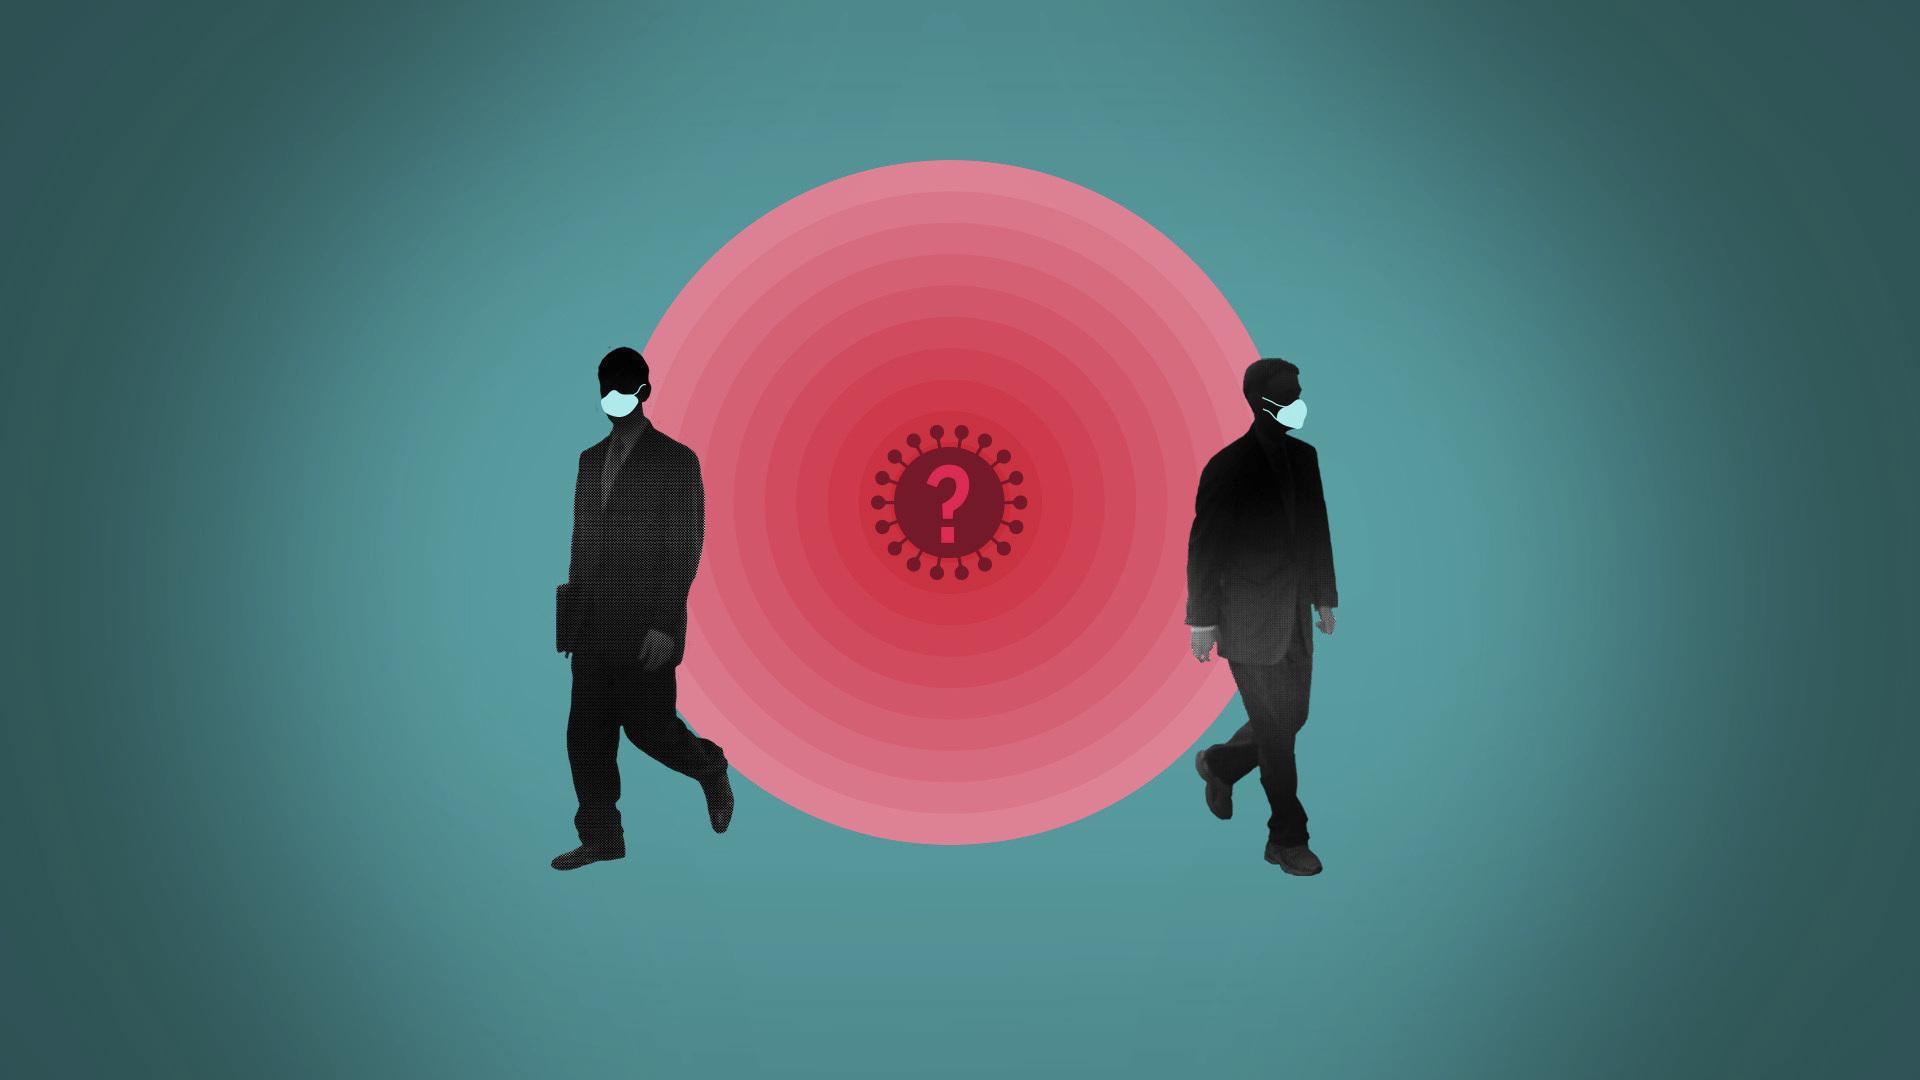 Virus-Outbreak-Viral-Questions-Masks